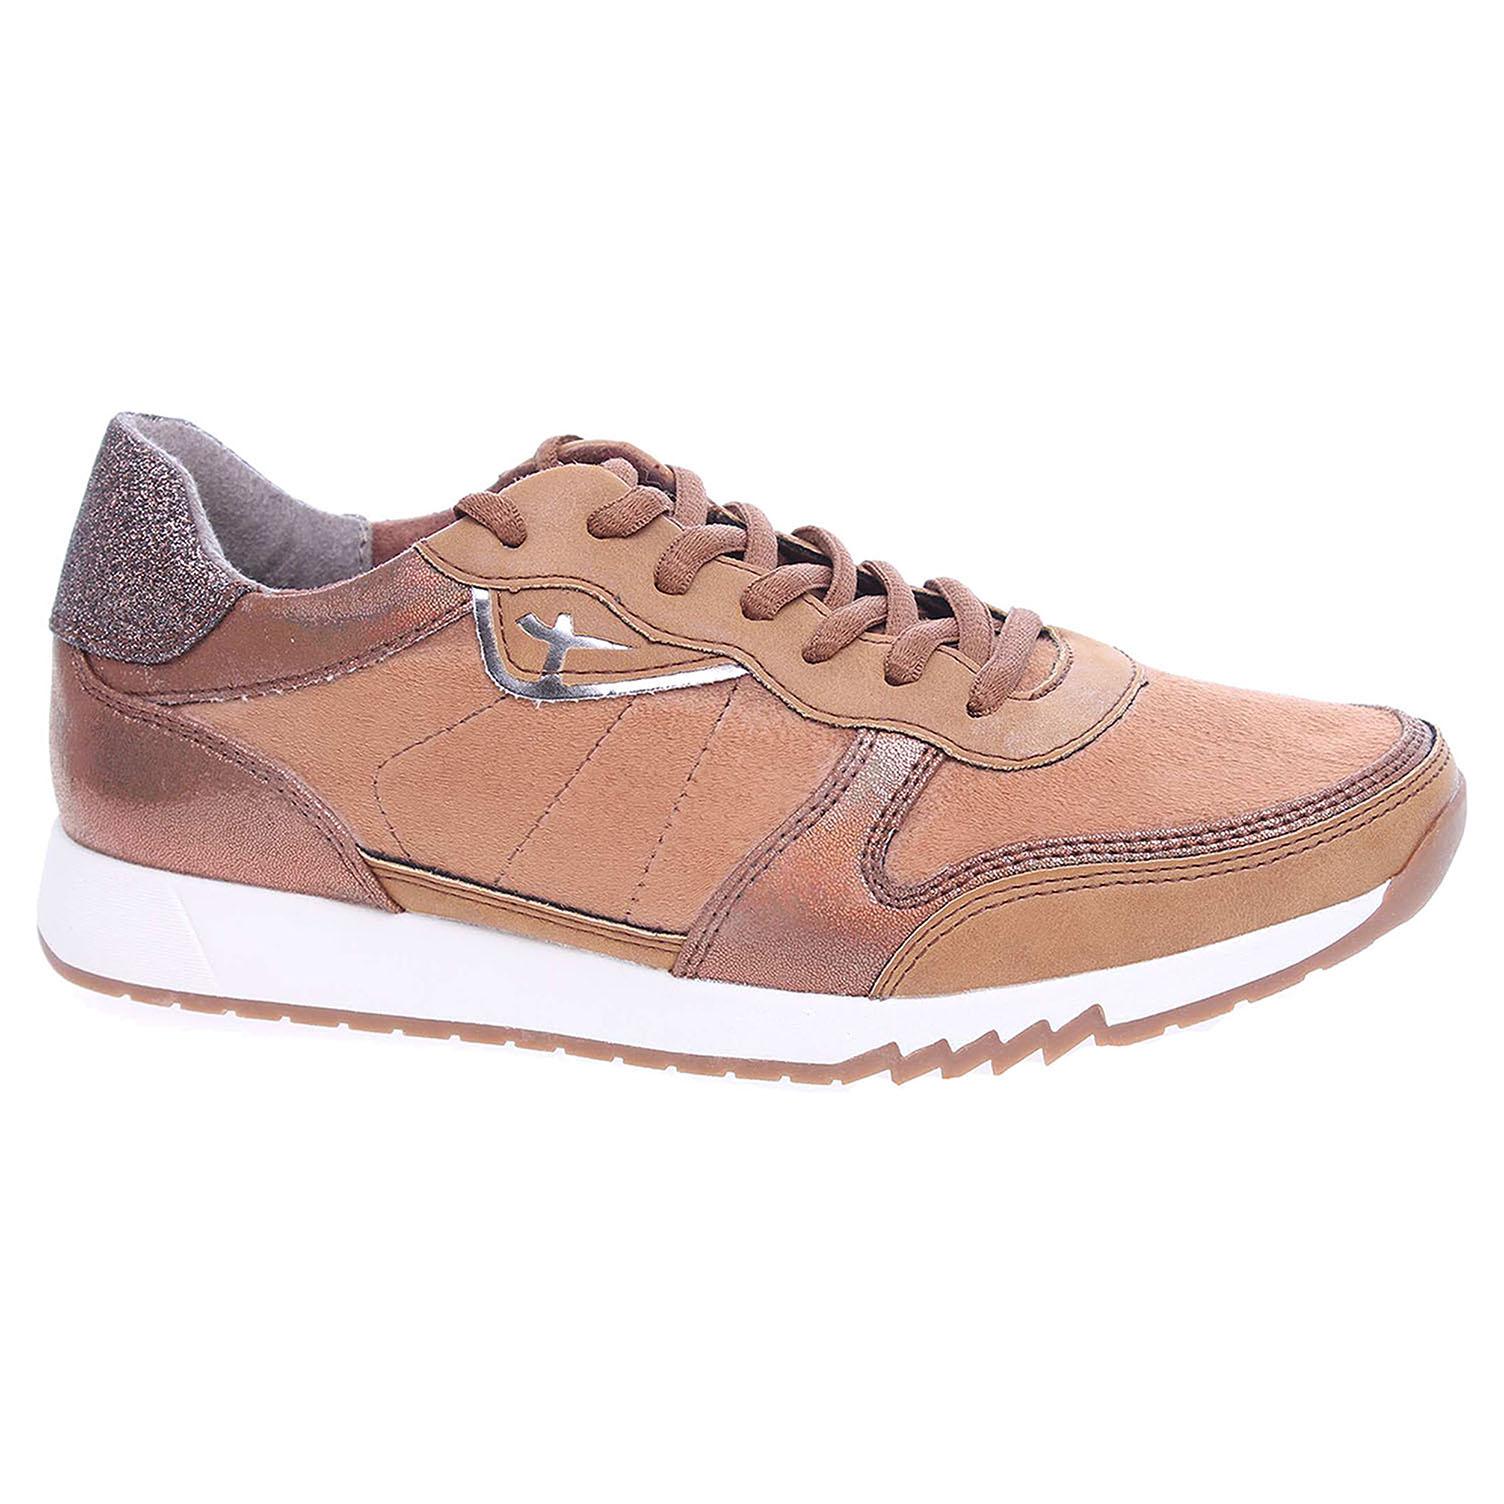 c17894312ccc Dámska topánky Tamaris 1-23602-27 hnědá